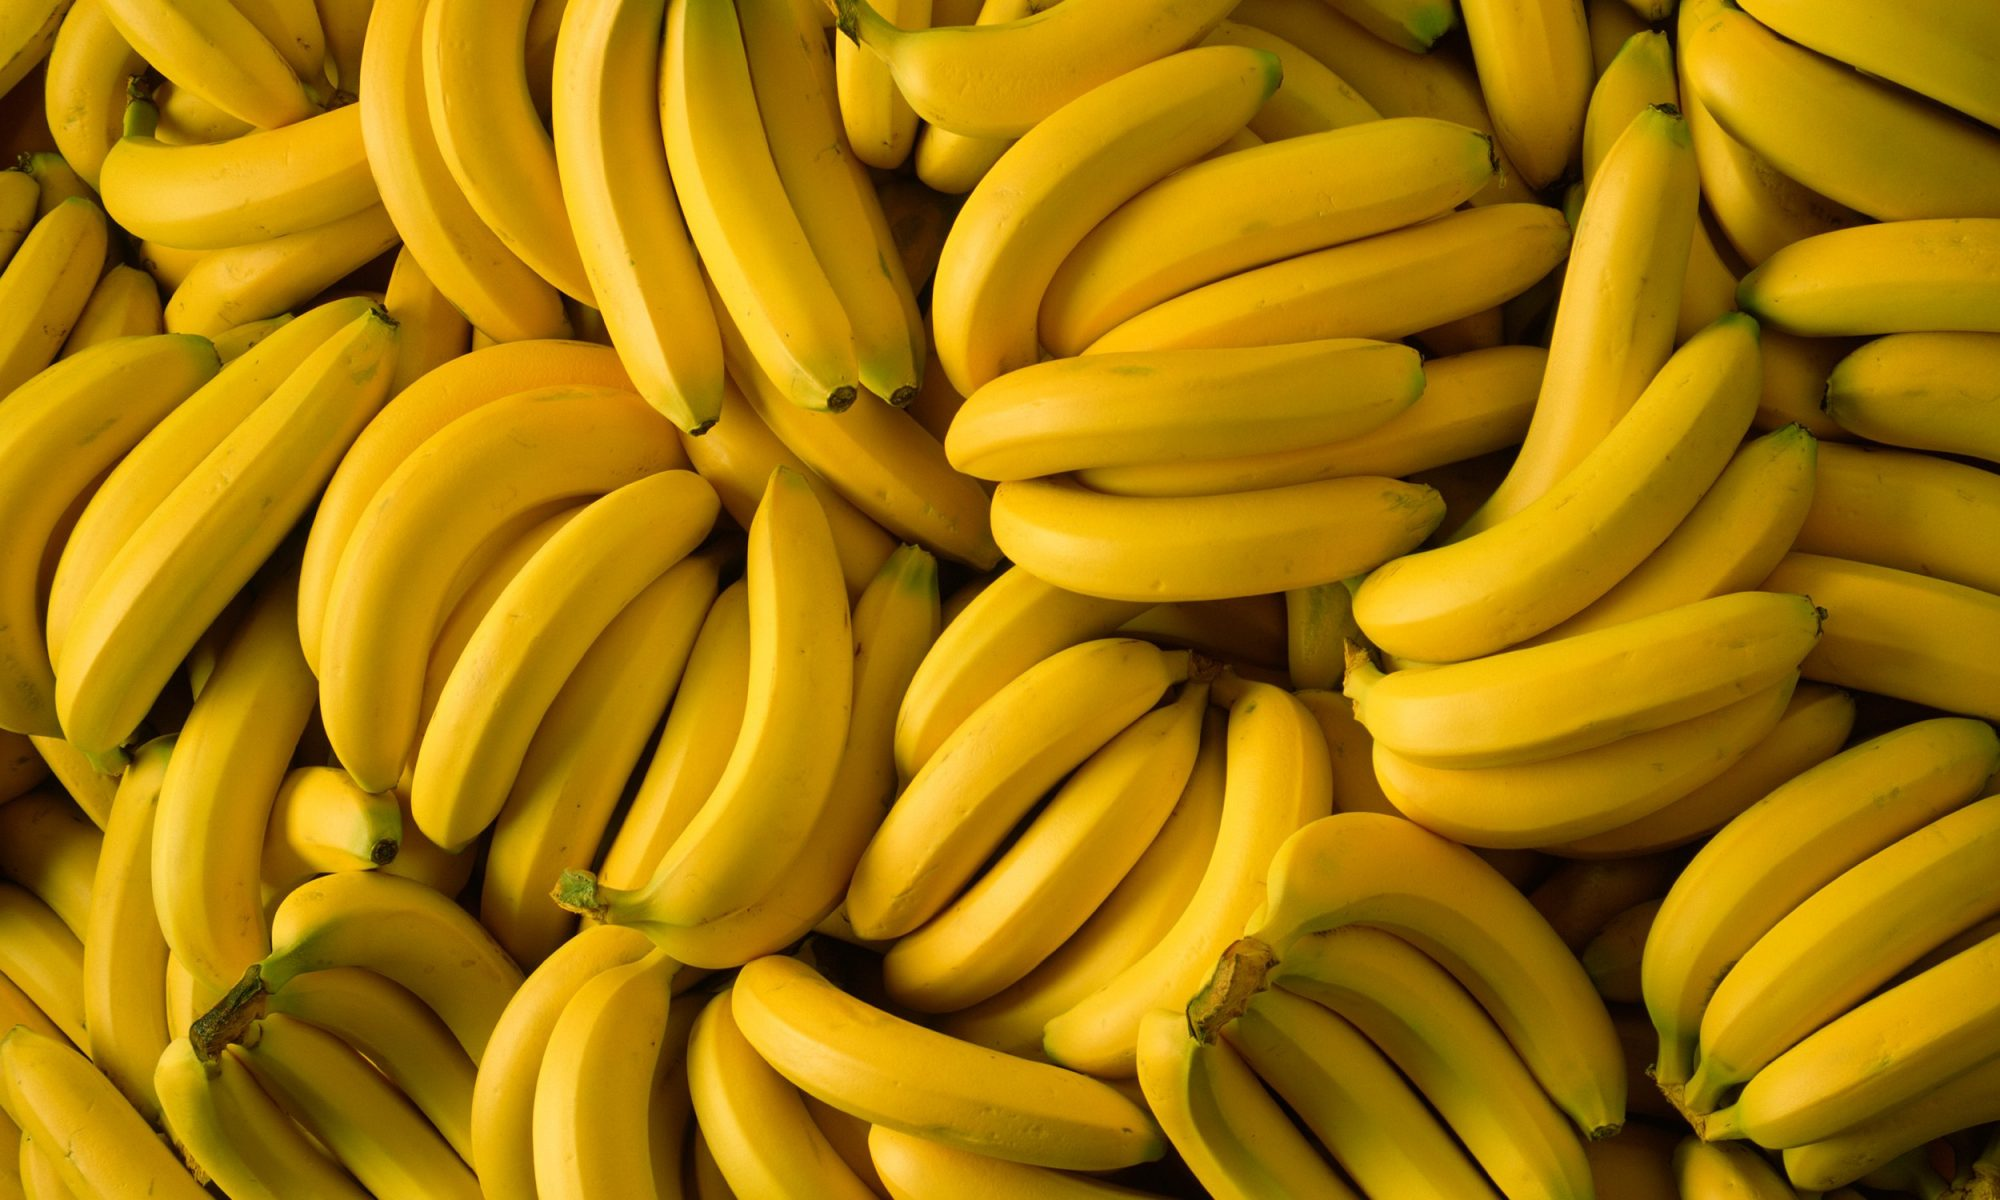 EC: Super-Food Bananas Could Help Thousands of Children Worldwide